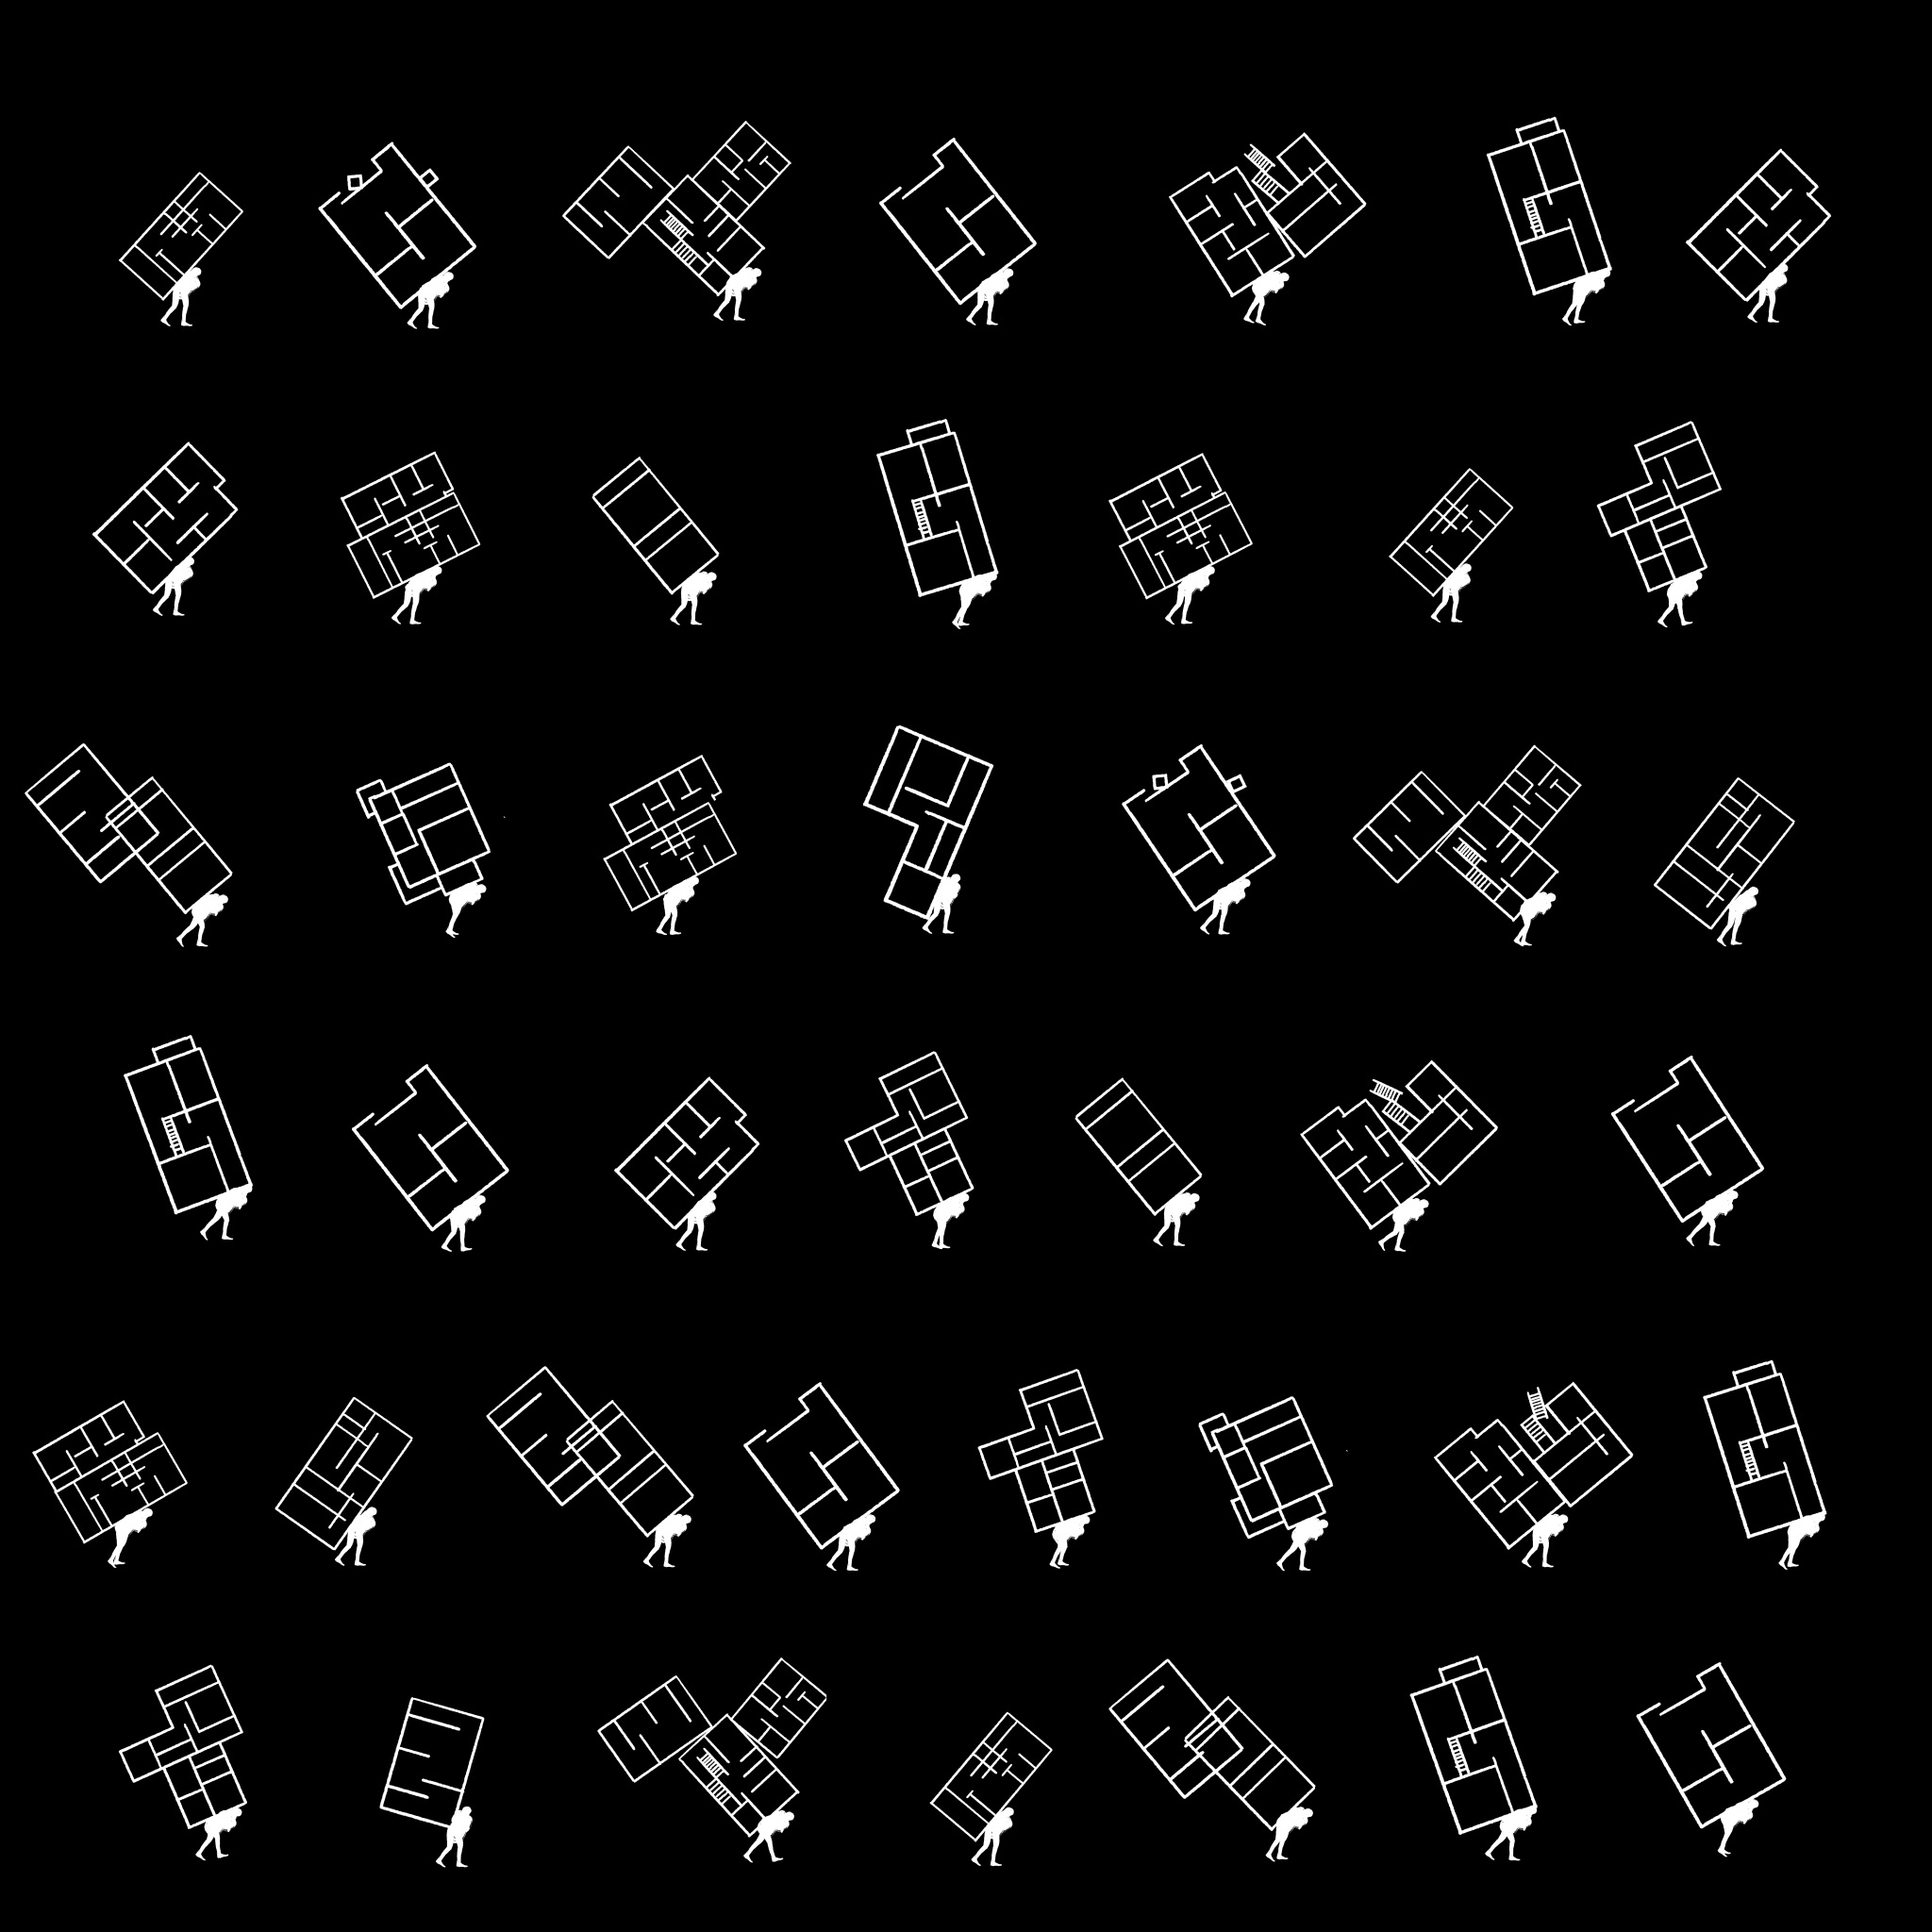 DRIFTERS_20181120-02.jpg